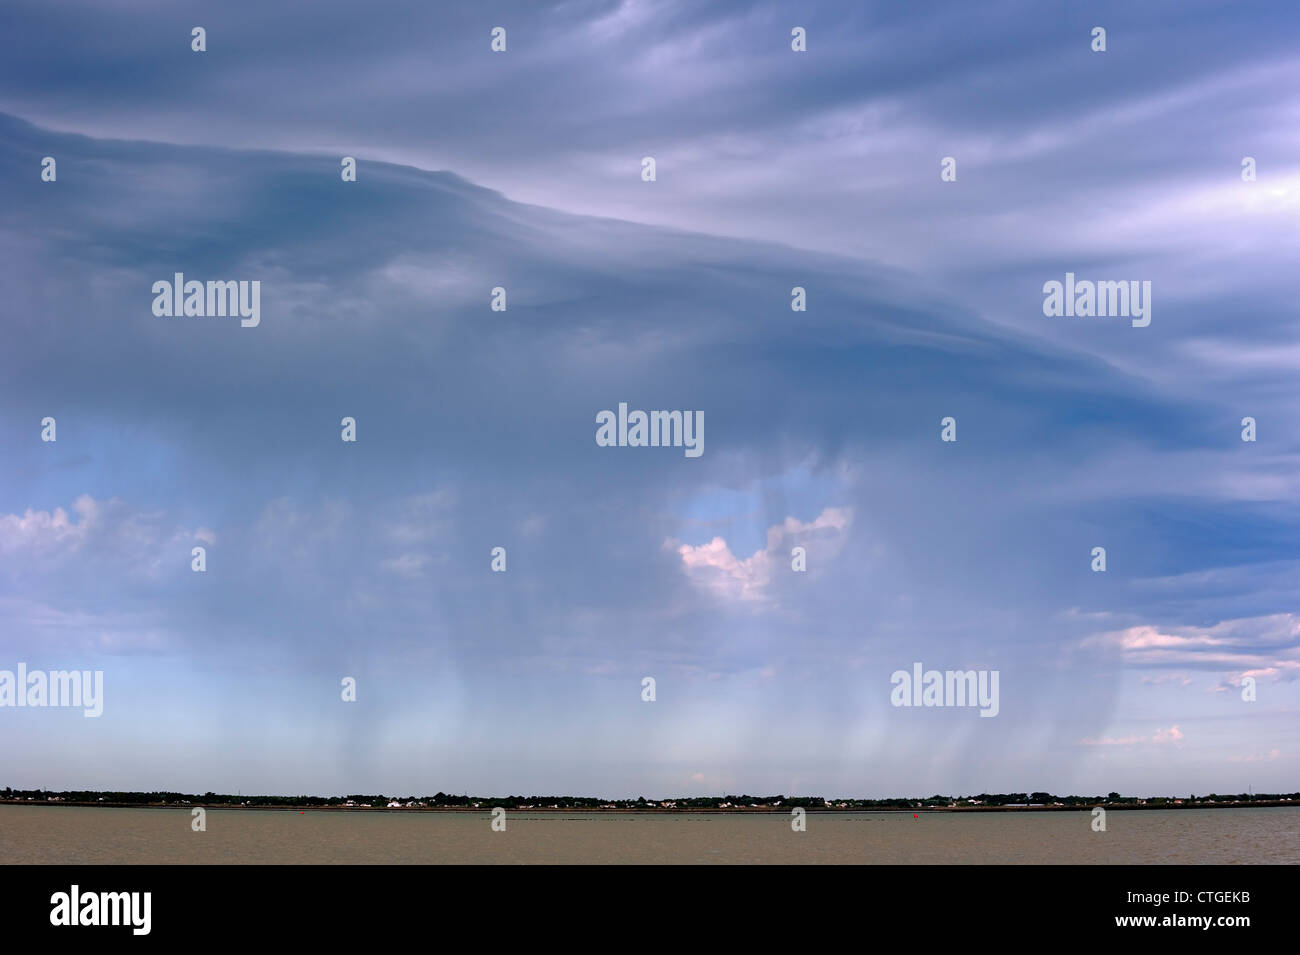 Cumulonimbus praecipitatio cloud causing rainfall over sea - Stock Image